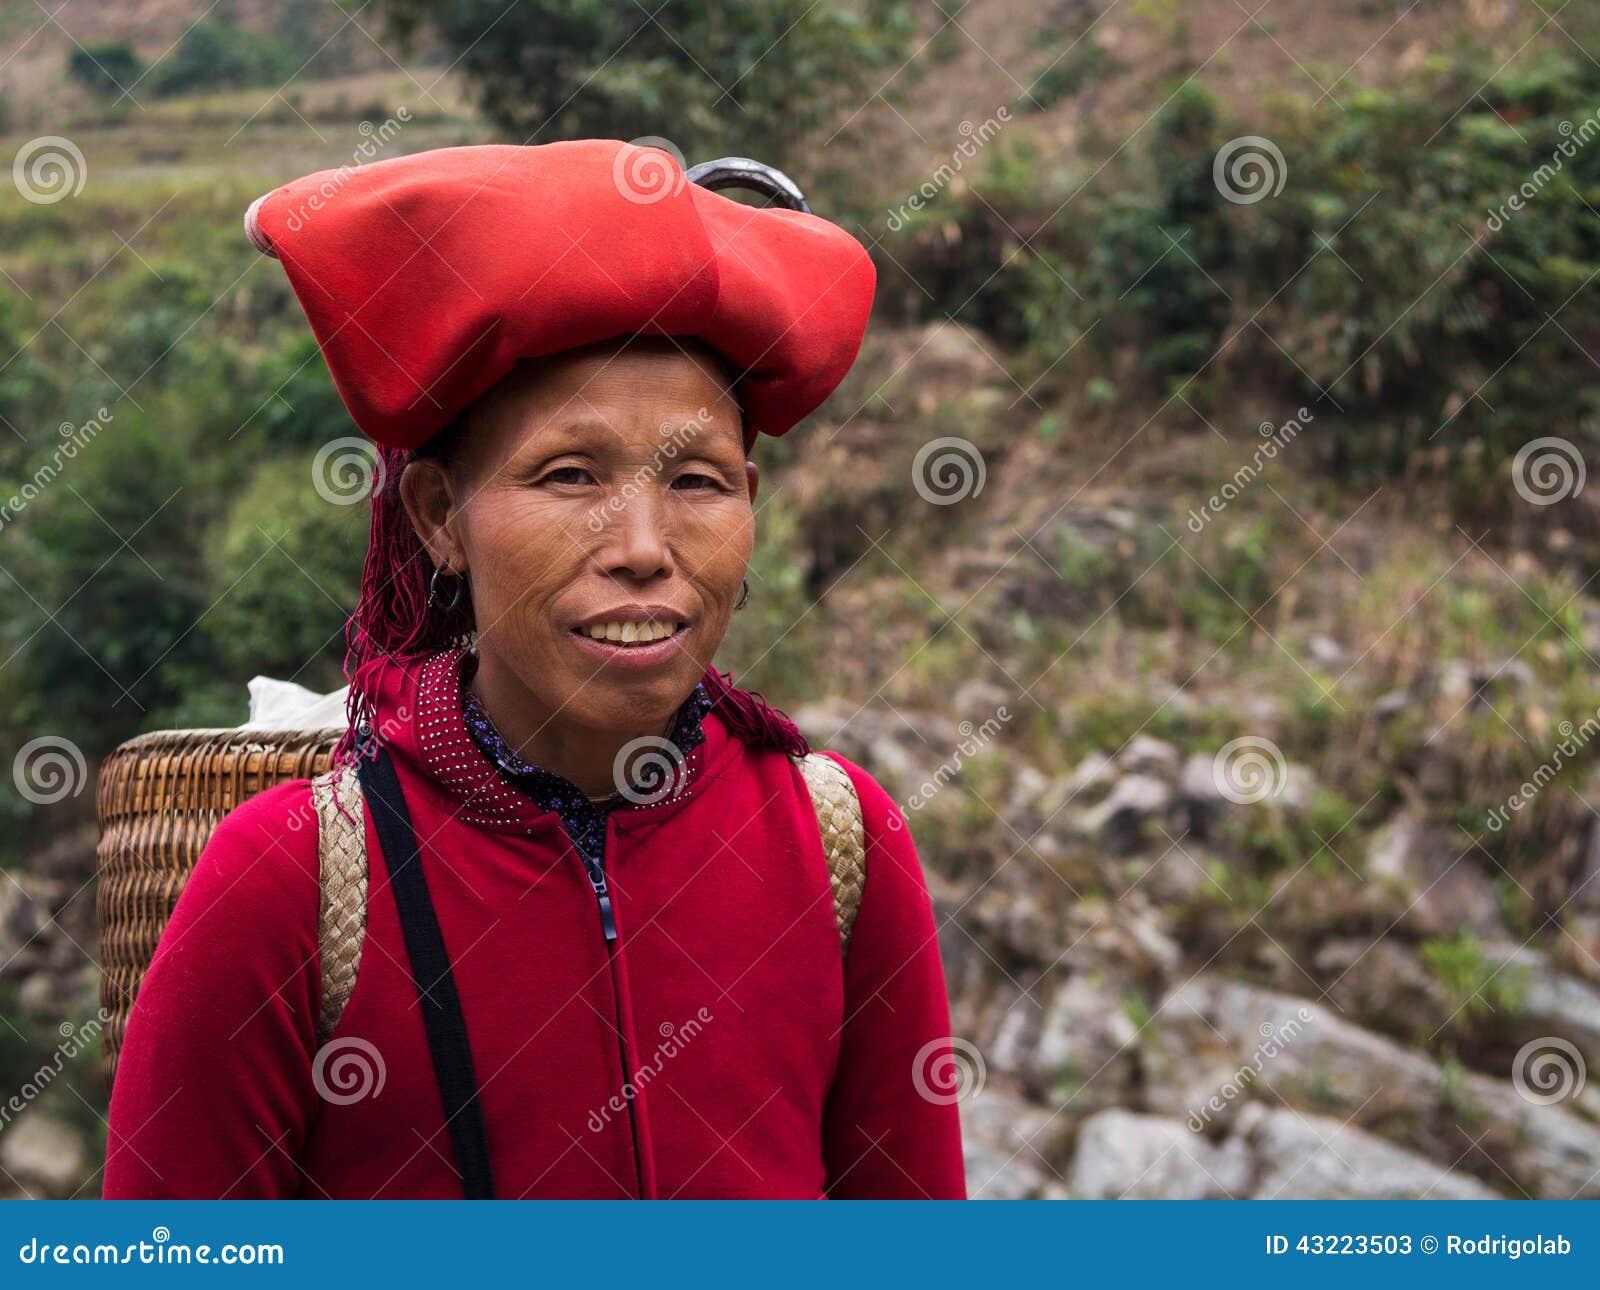 Rotes Dao Woman Wearing Traditional Headdress, Sapa, Lao Cai, Viet